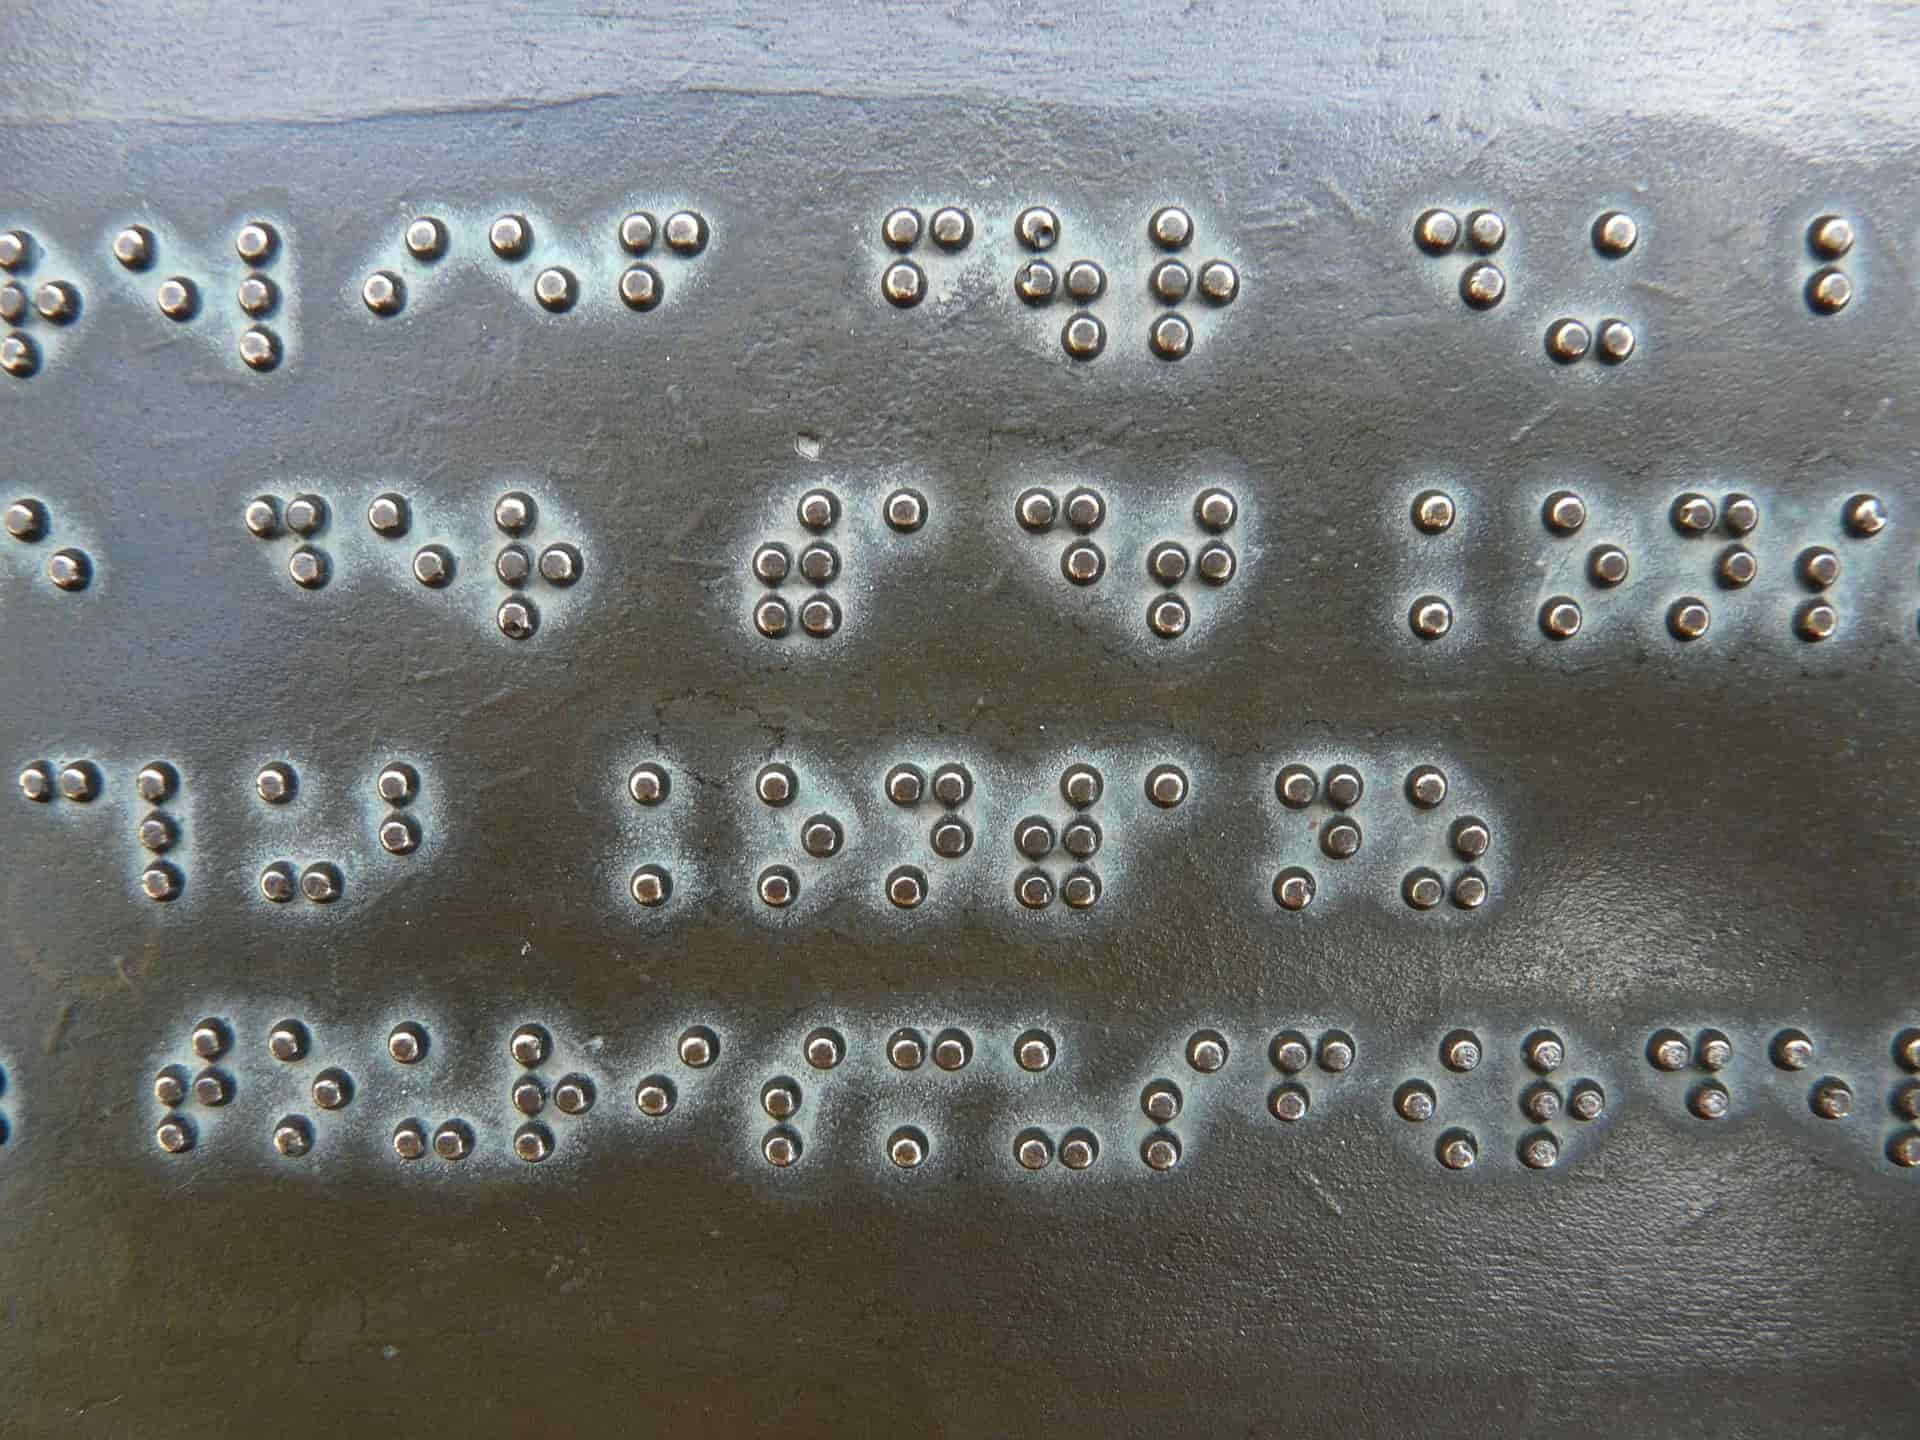 Biblioteka Emgu CV i alfabet Braille